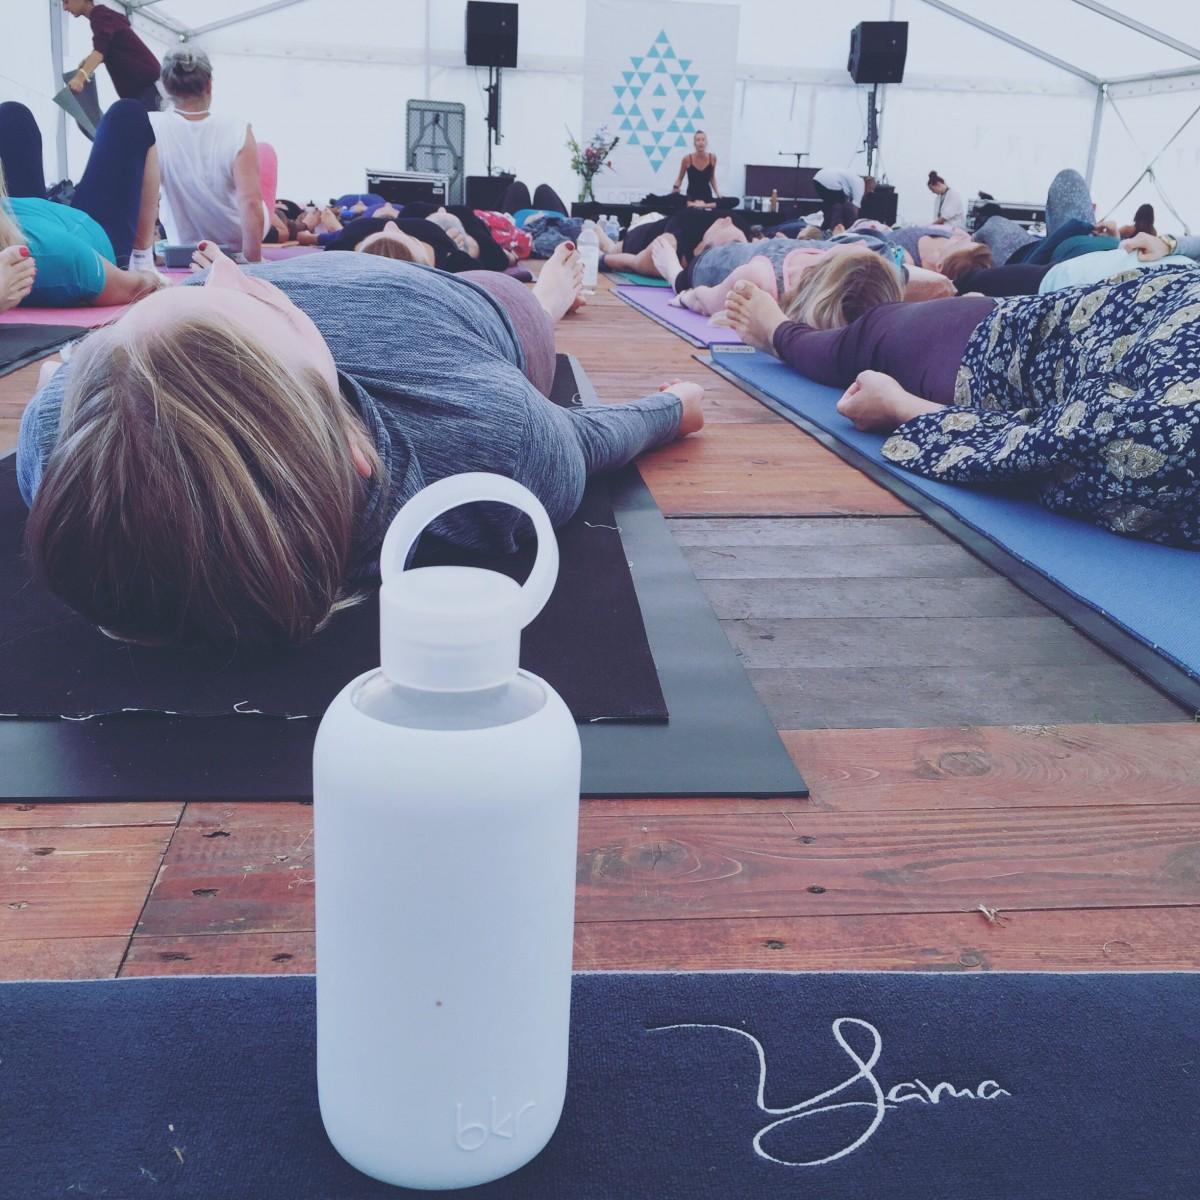 yoga, copenhagen yoga festival, festival, yogi, københavn, vinyasa, costume, simplyfit, hatha, namaste, yama, innocent, BKR, zen, ro, simply fit, kombucha, adidas, sundays, lazy, well spend, lululemon